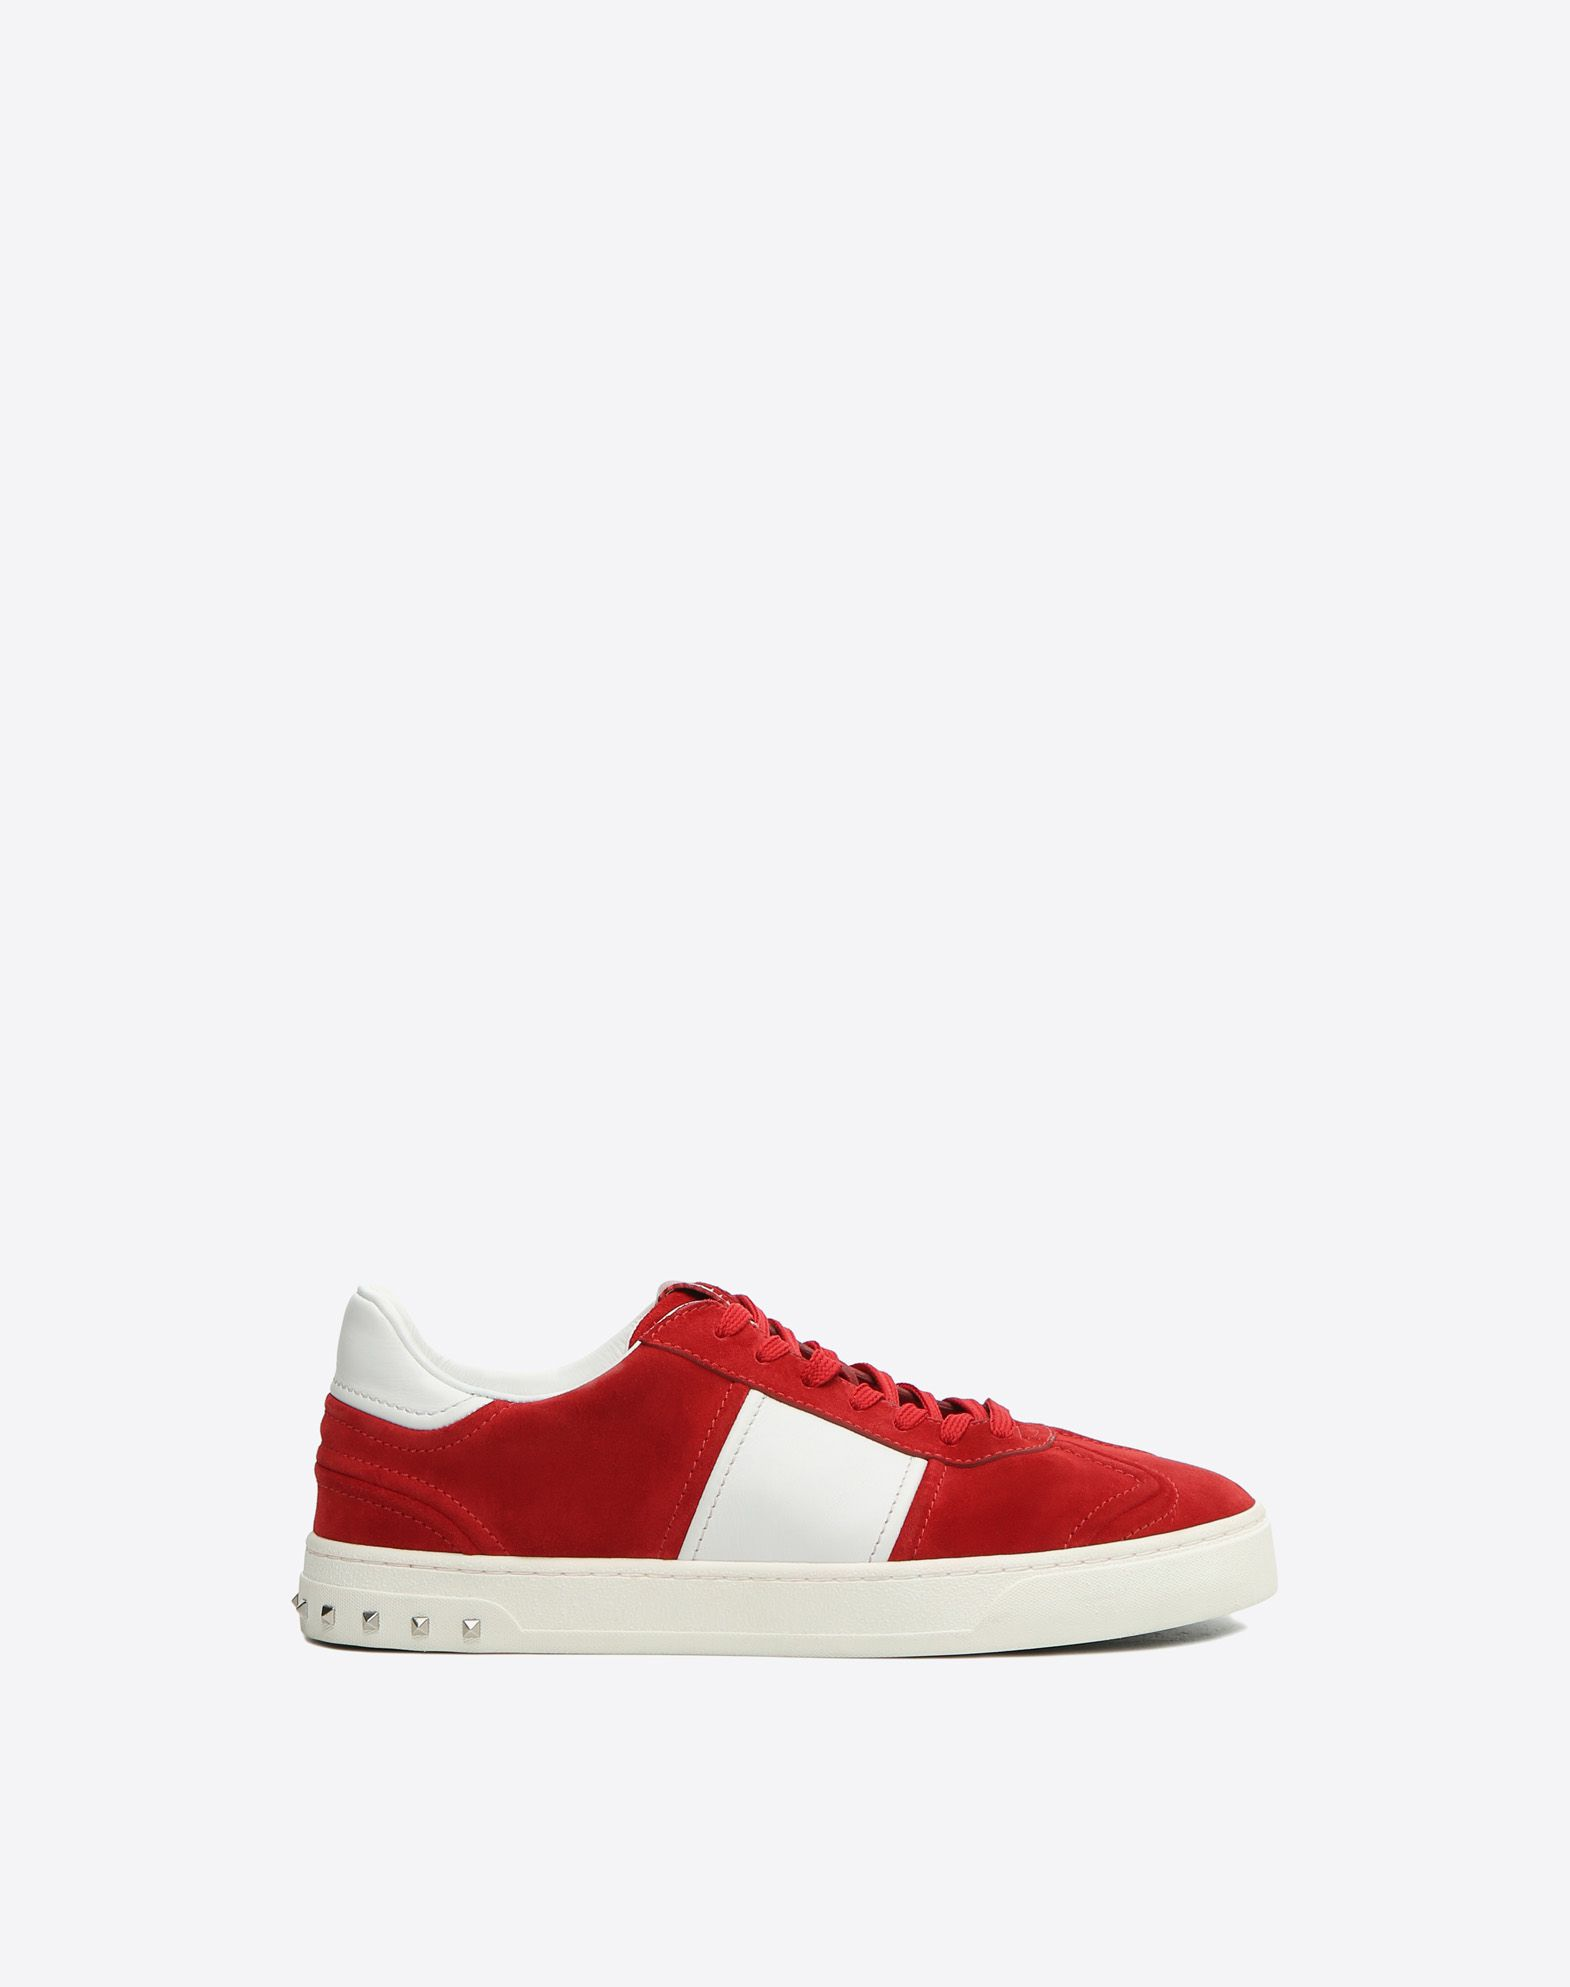 Flycrew sneakers - Red Valentino 8dSeTKG